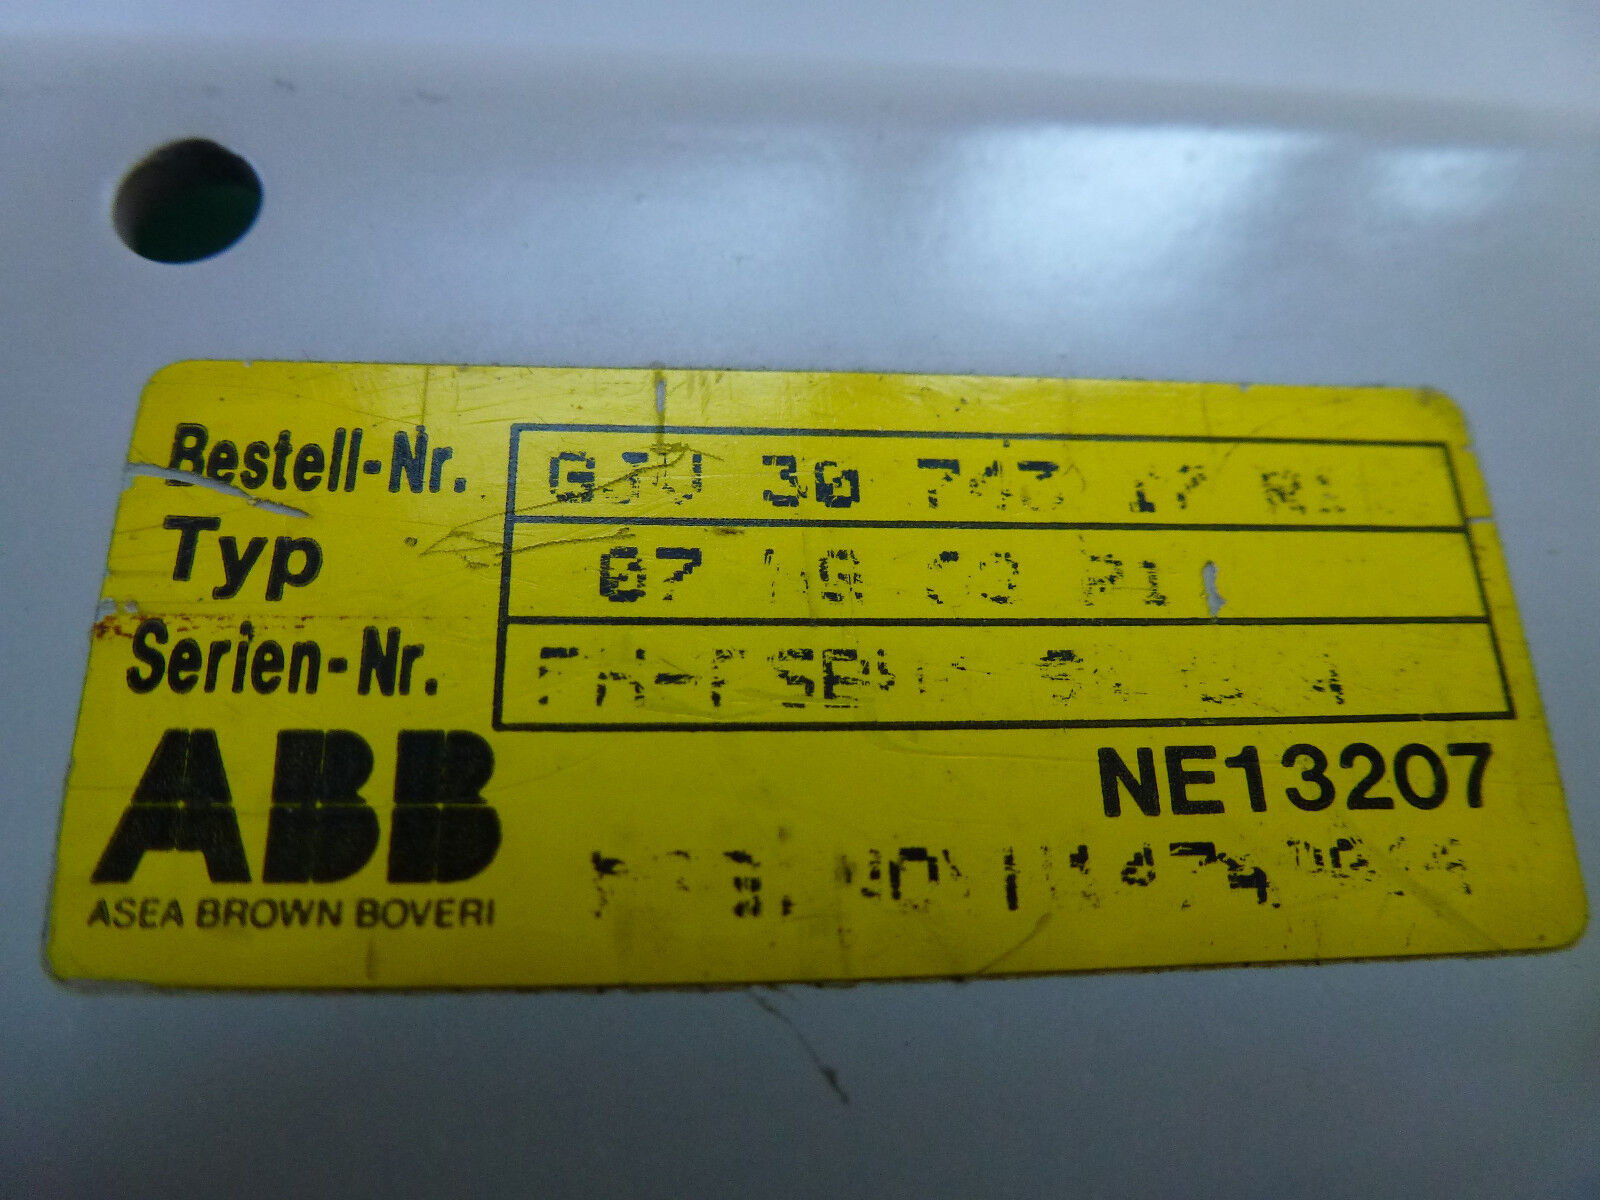 ABB 07 NG 68 r1 r1 r1 Order No. gjv 30 743 17 r1 procontic t 200 bloc d'alimentation b35b1e